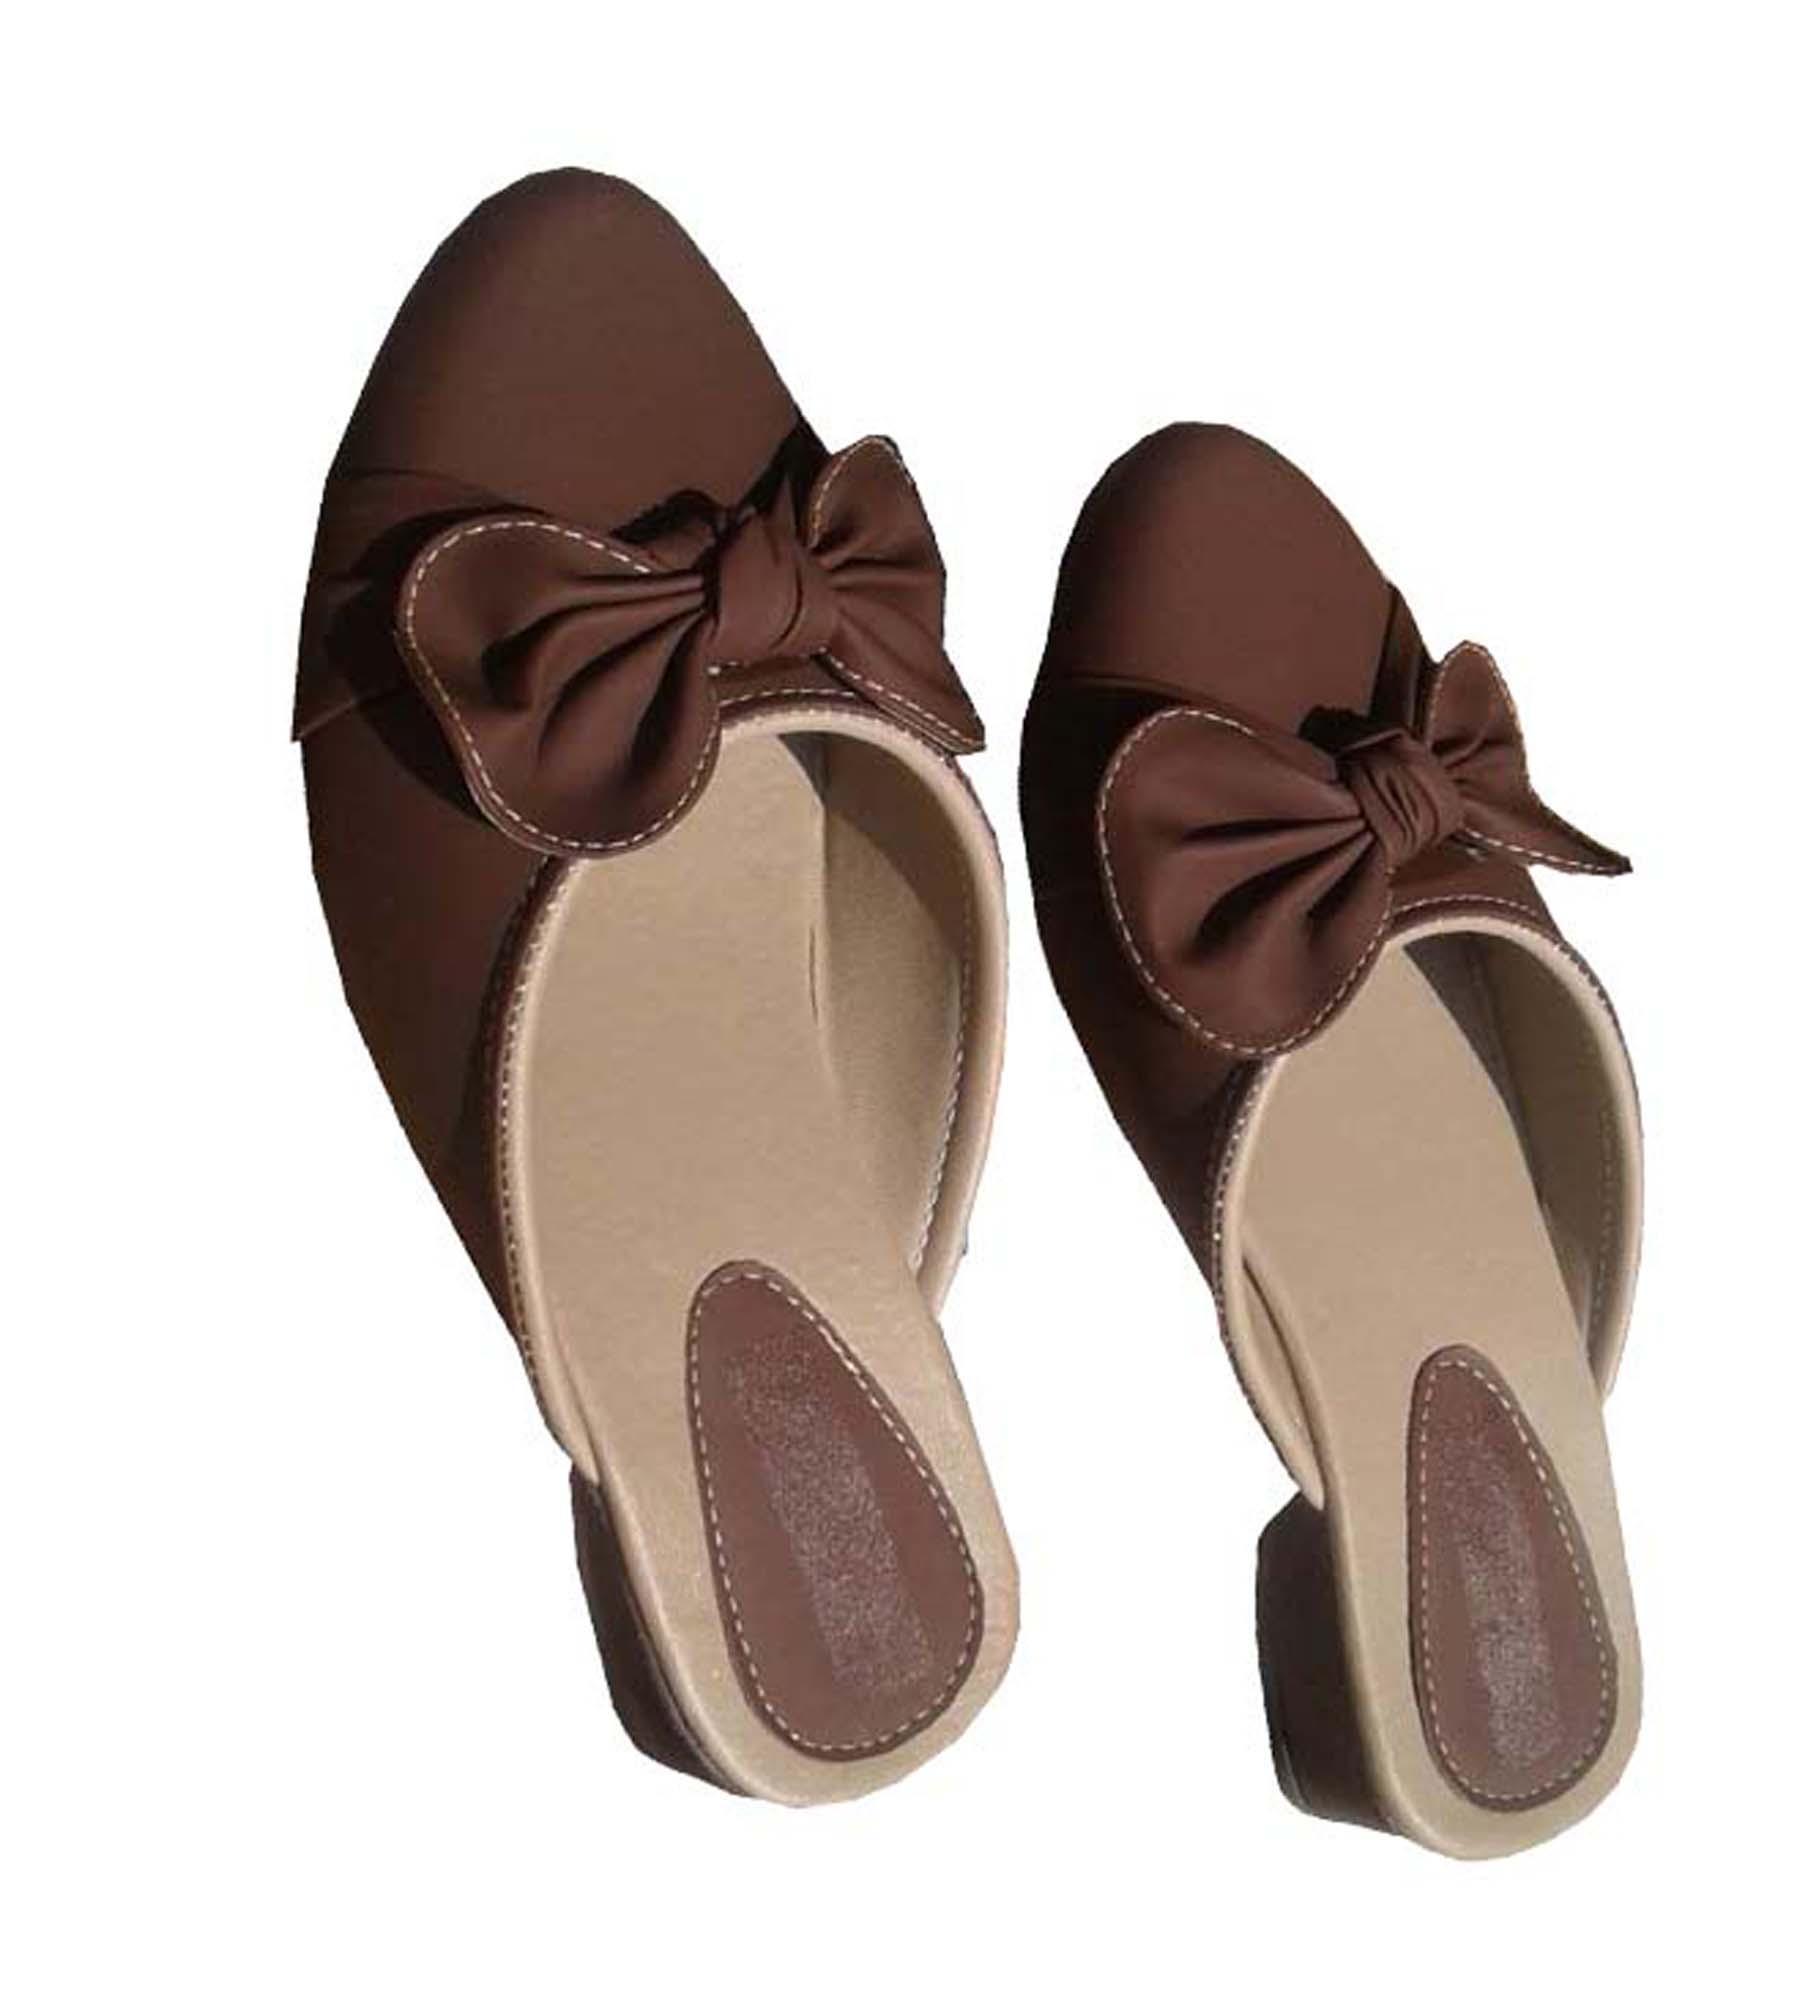 Diky Noval/ Sandal Wanita/ Sandal selops Wanita/ flatshoes / Sandal casual